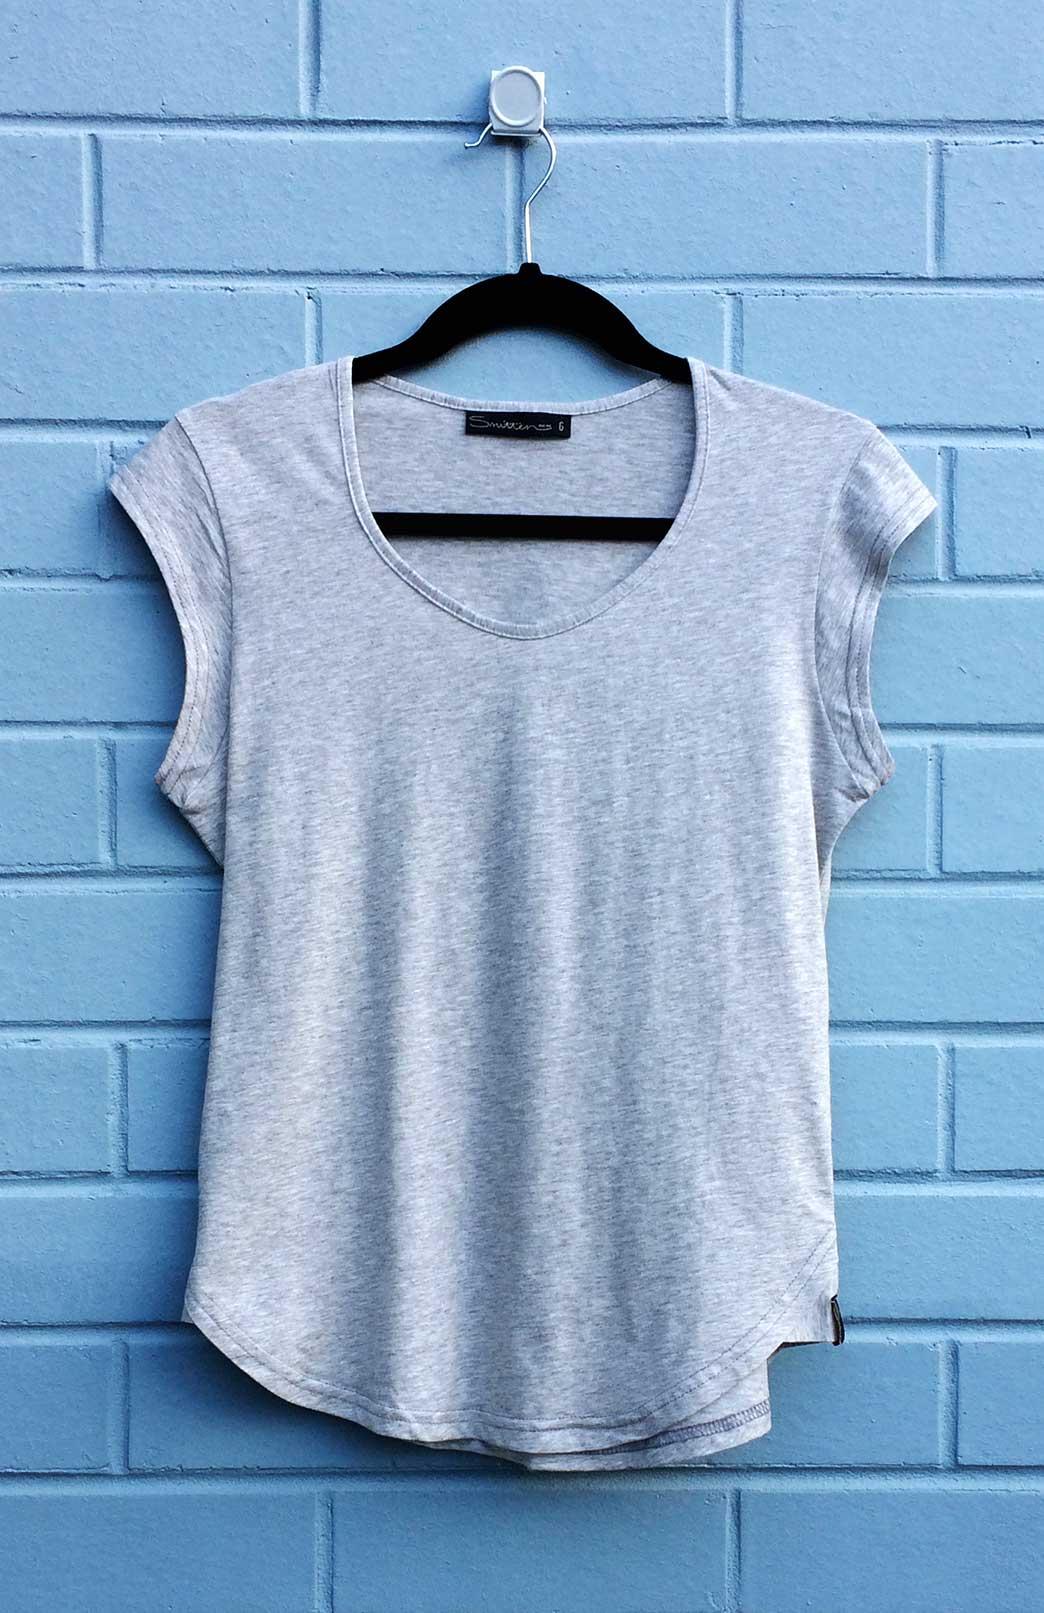 Cap Sleeve T Shirt Women S Light Grey Marl Organic